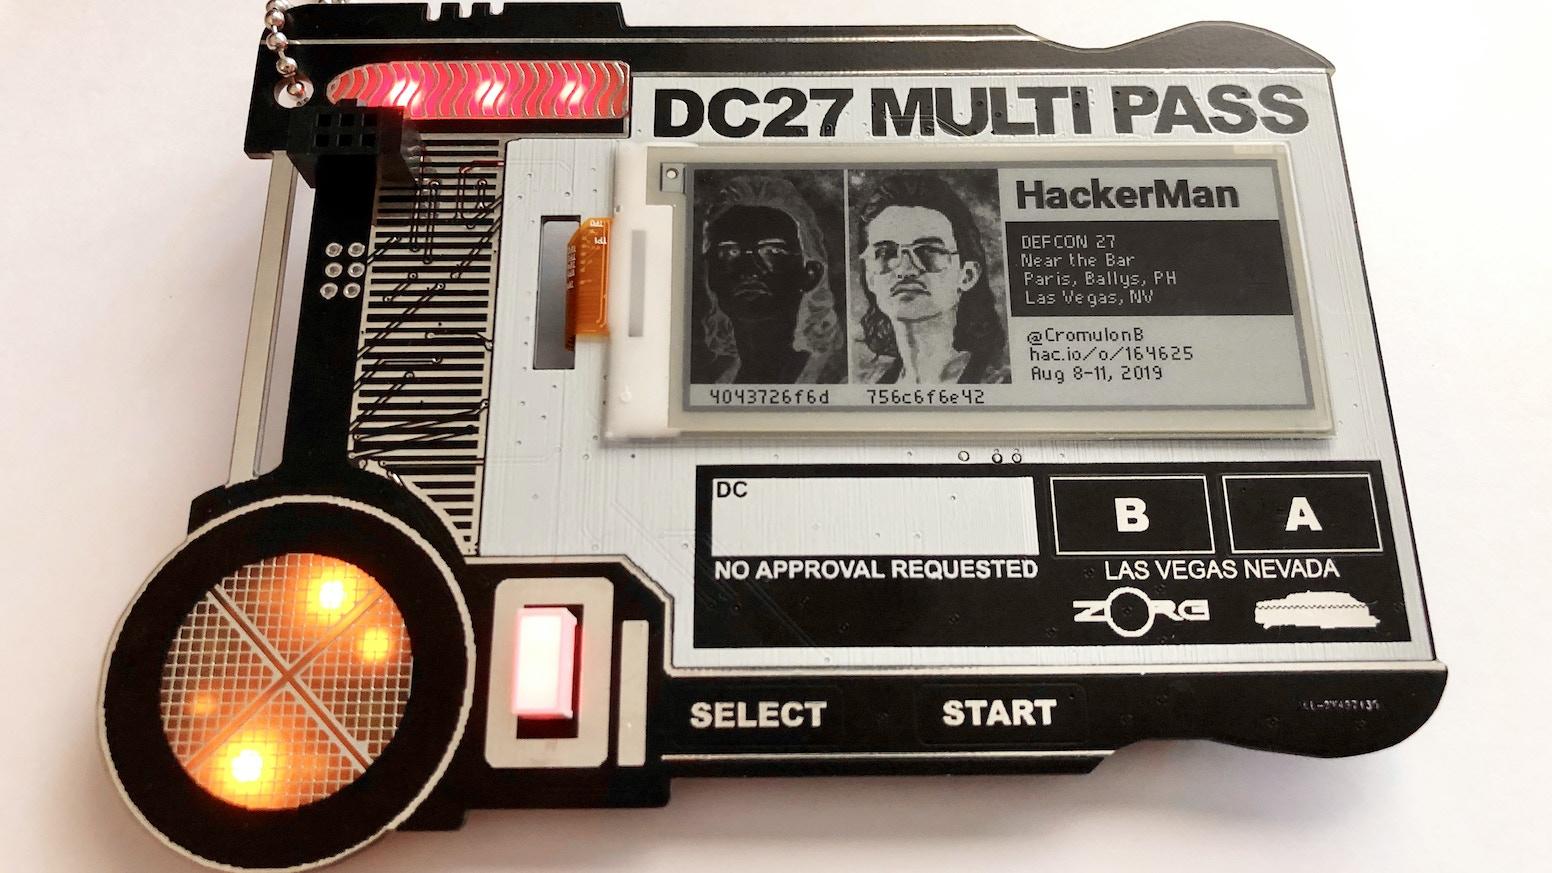 MULTI PASS / DEF CON 27 Indie Badge by Bliss Jourdan — Kickstarter